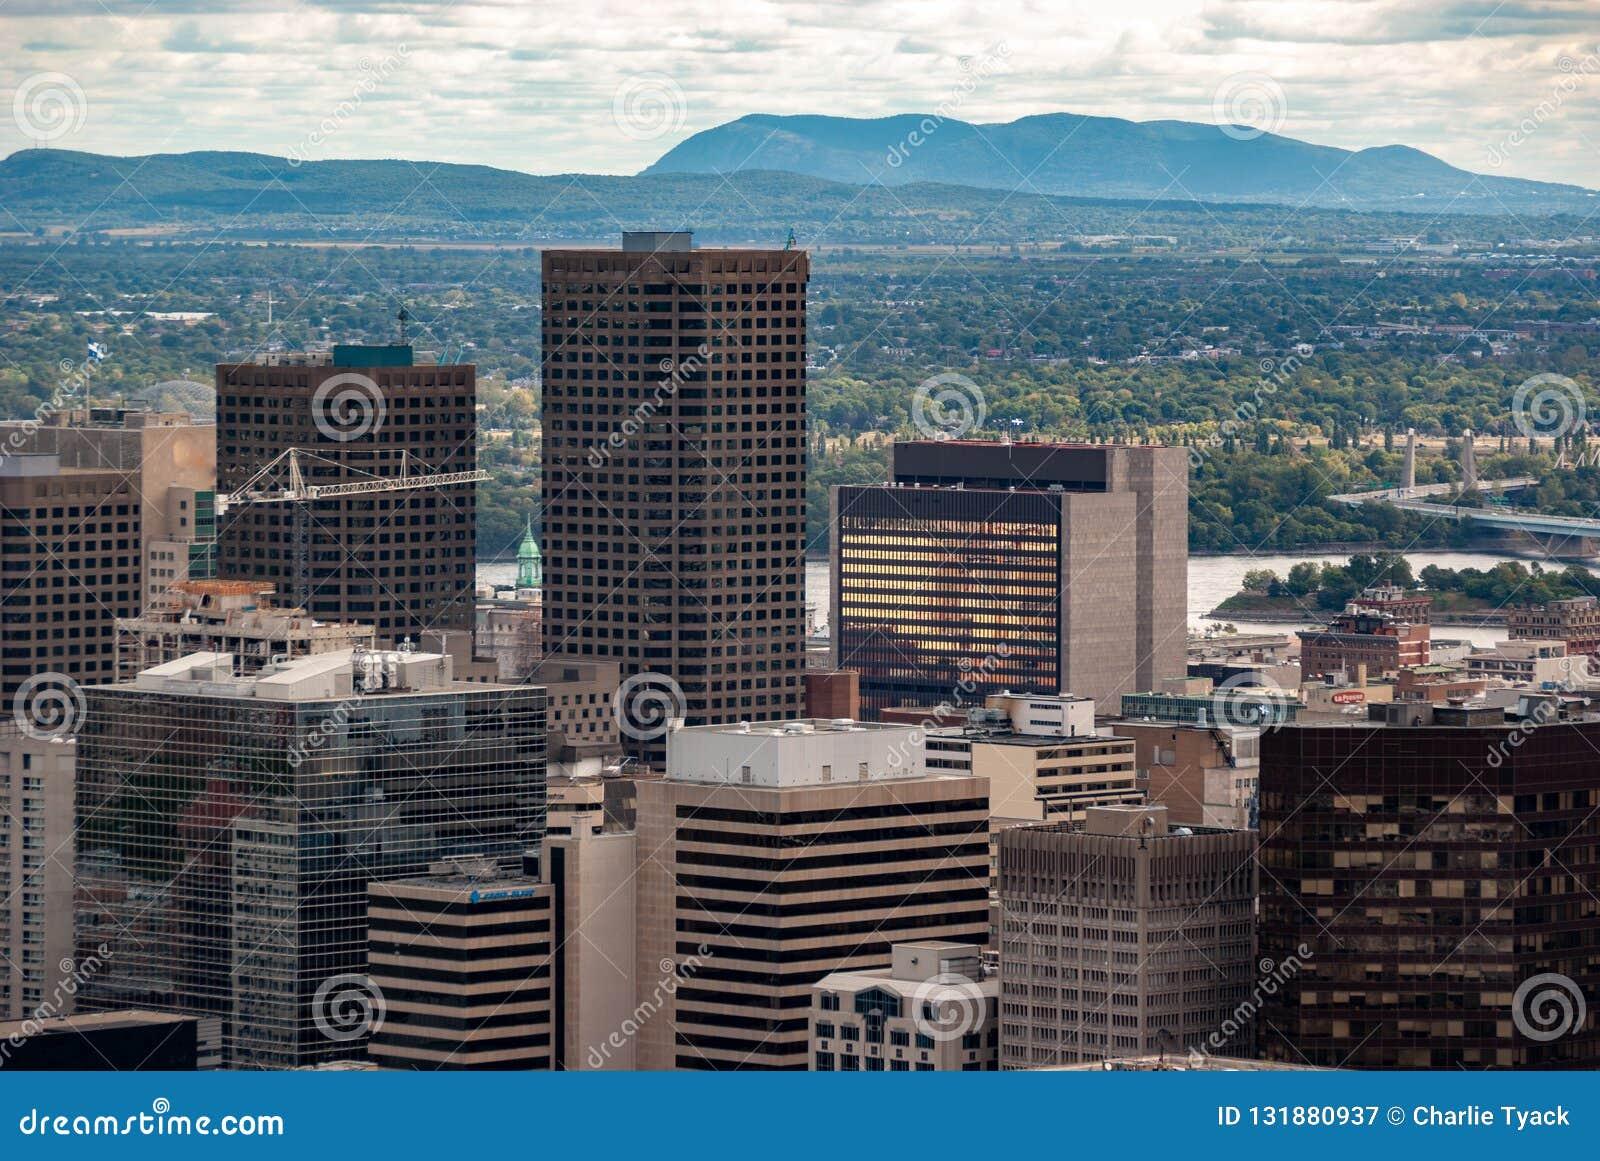 Skyline de Montreal - os arranha-céus do distrito financeiro